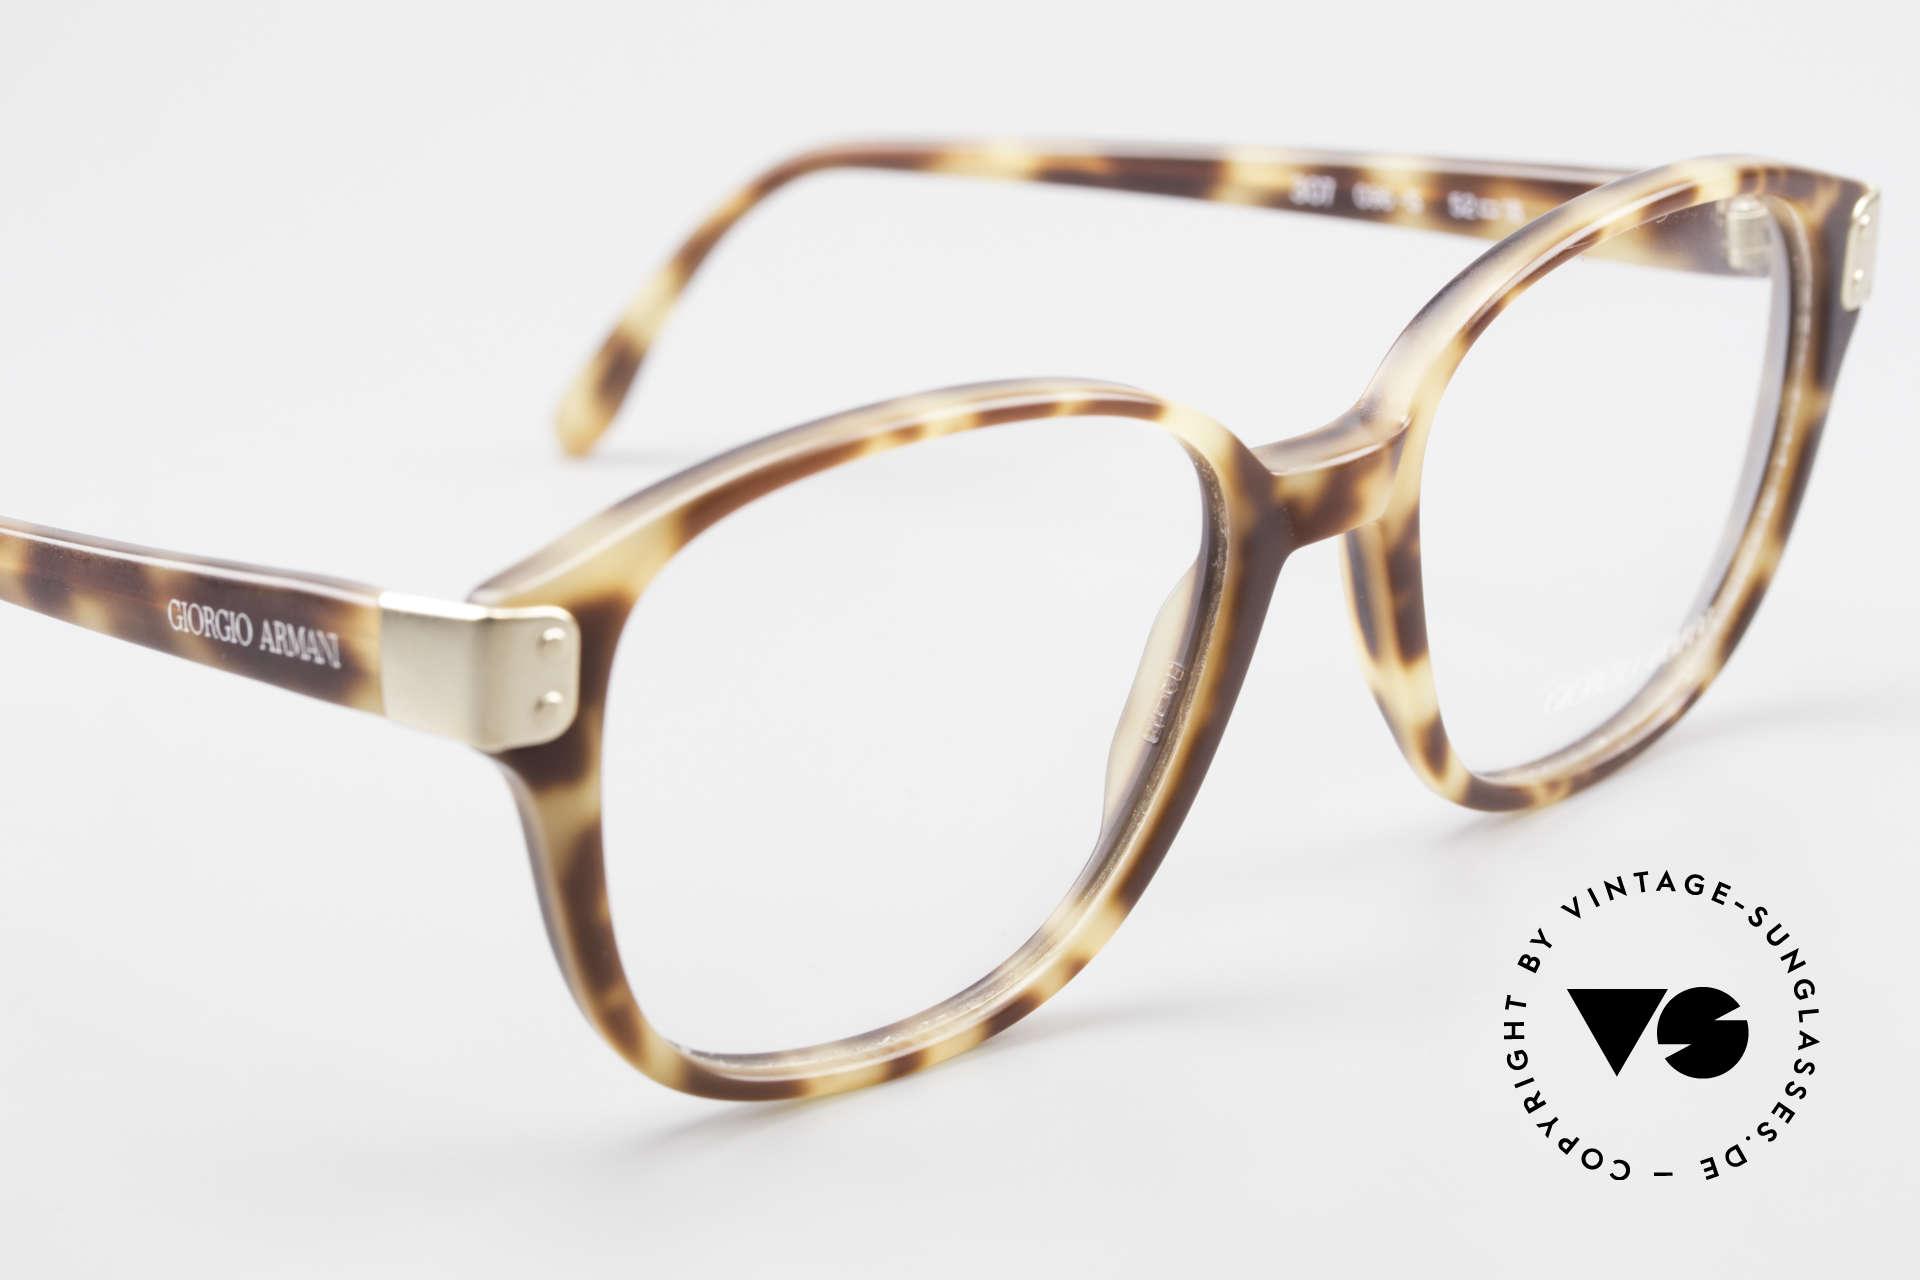 Giorgio Armani 307 Classic 80's Vintage Glasses, NO retro specs, but a unique 30 years old ORIGINAL!, Made for Men and Women